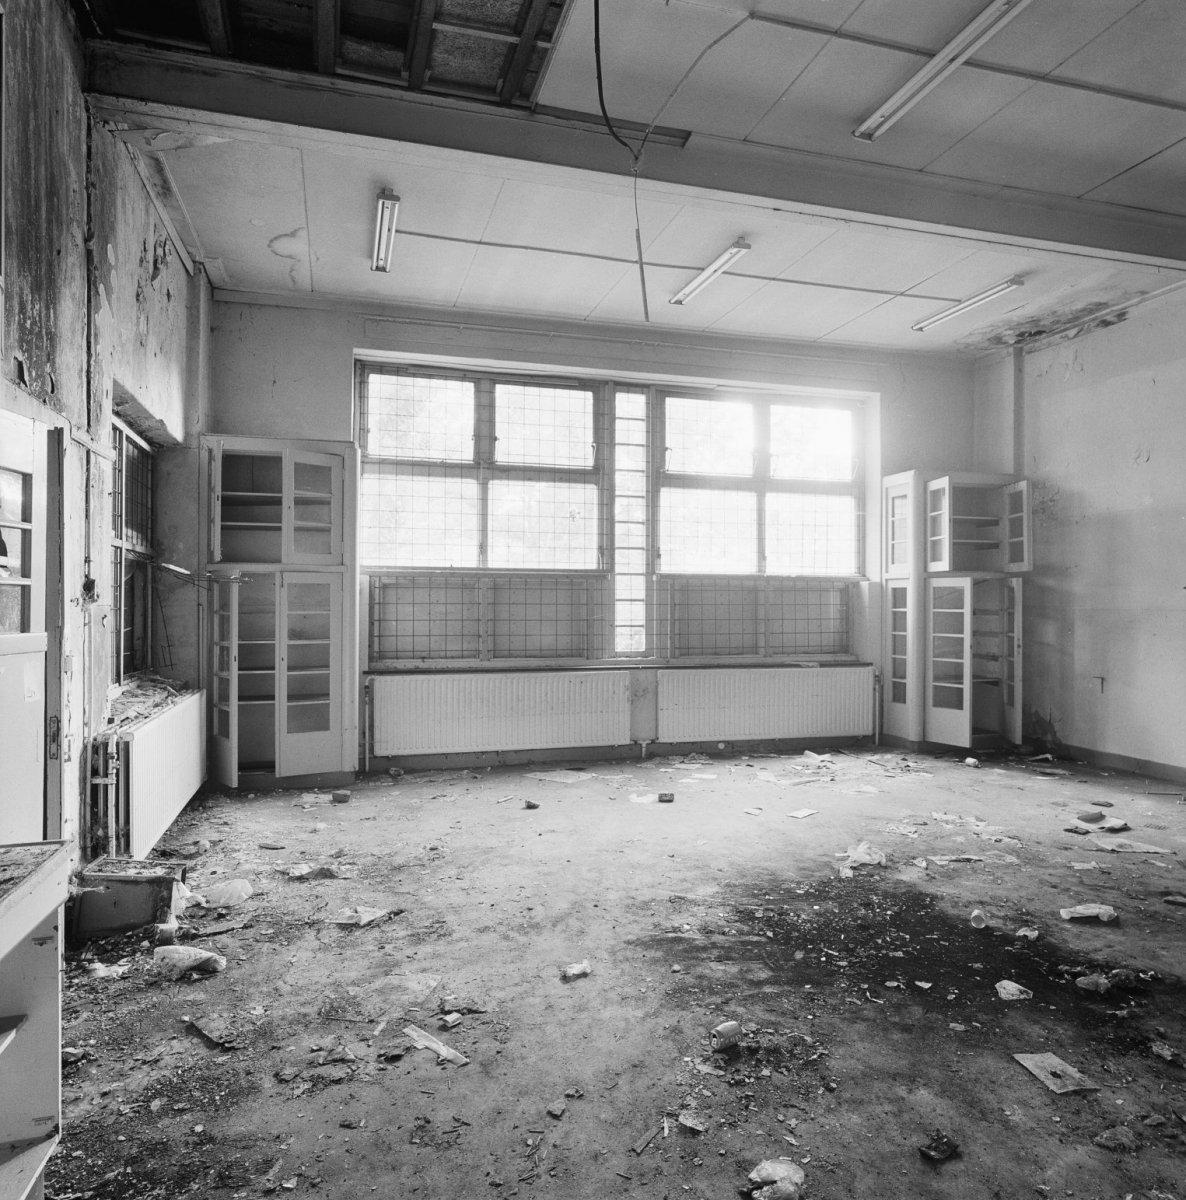 File:Interieur school, overzicht gemeenschapsruimte - Sittard ...